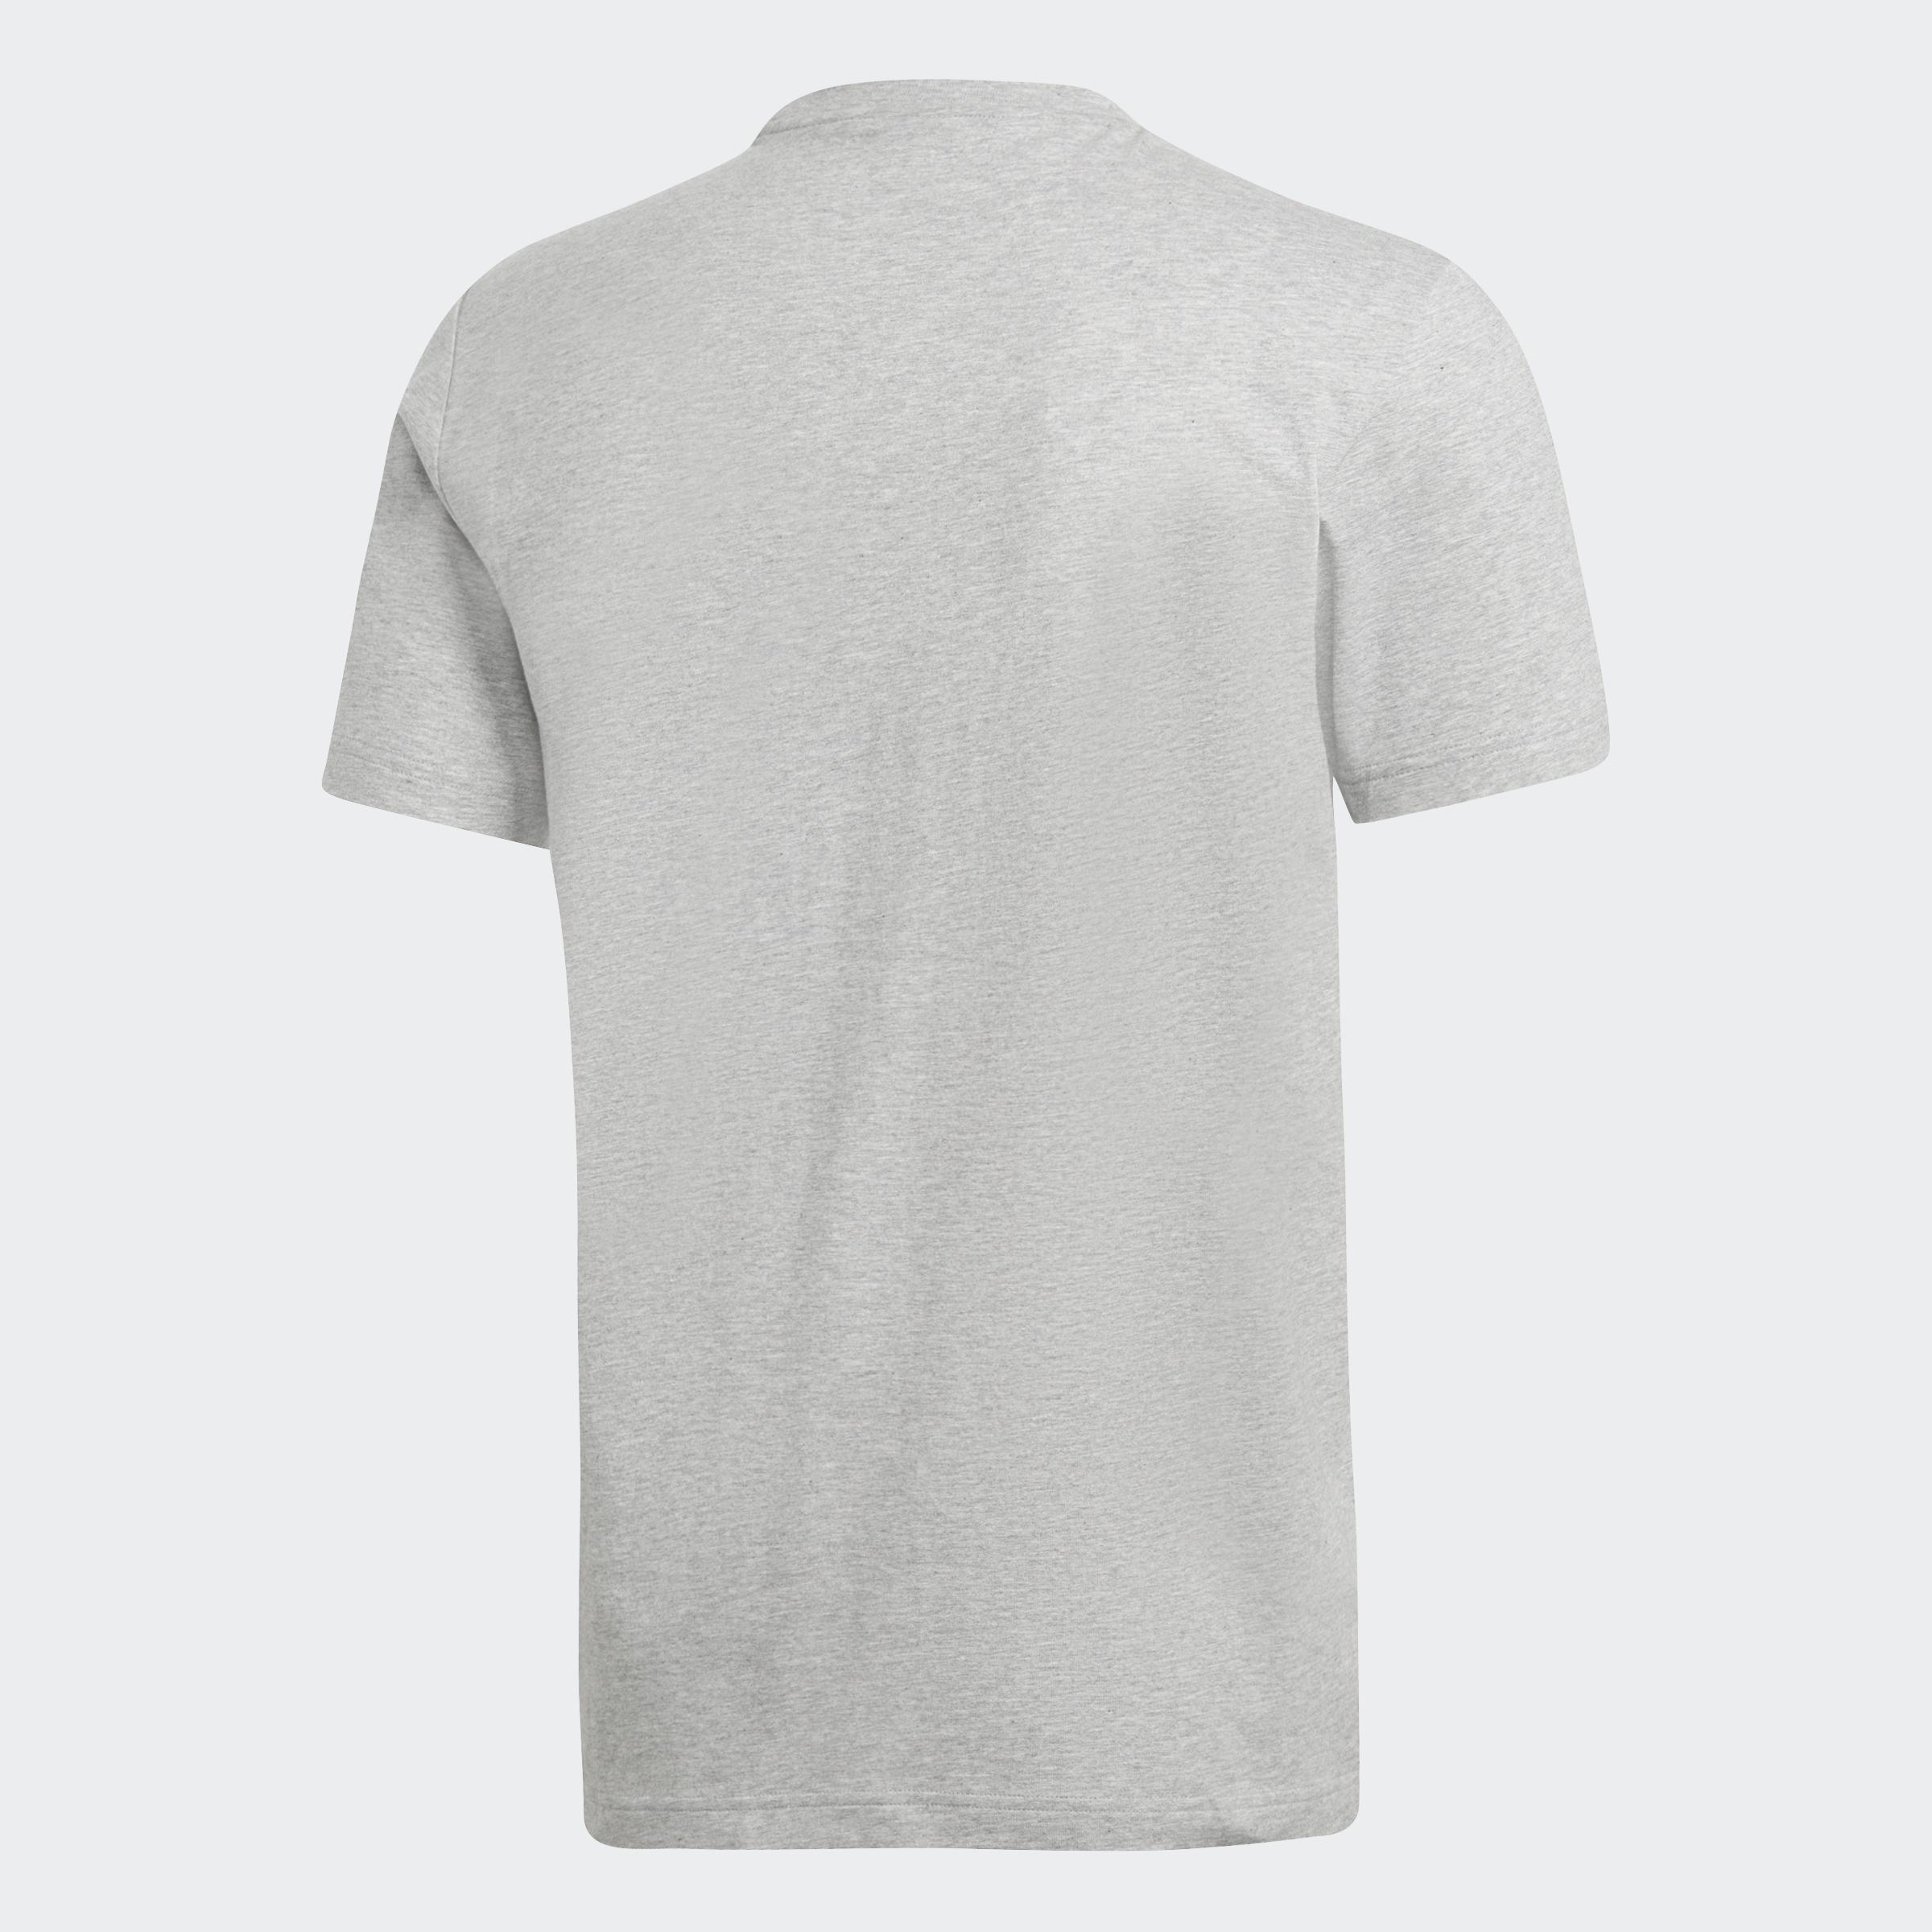 adidas-Must-Haves-Badge-of-Sport-Tee-Men-039-s-Shirts thumbnail 6